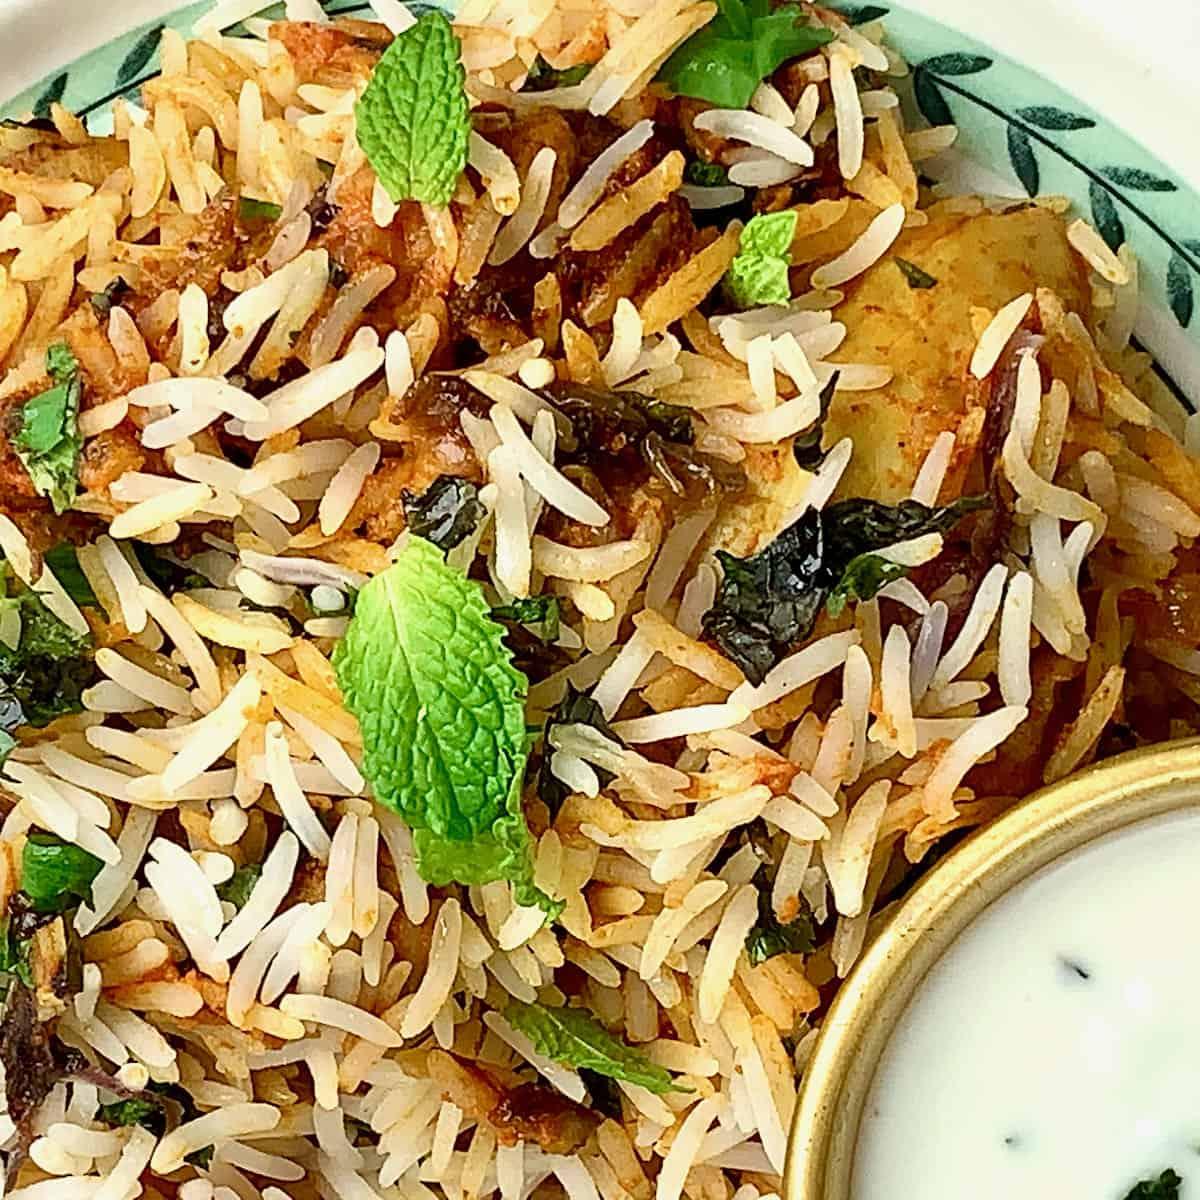 Tandoori Chicken Tikka Biryani served on a pretty plate with a flutter of fresh herbs and a side of raita.